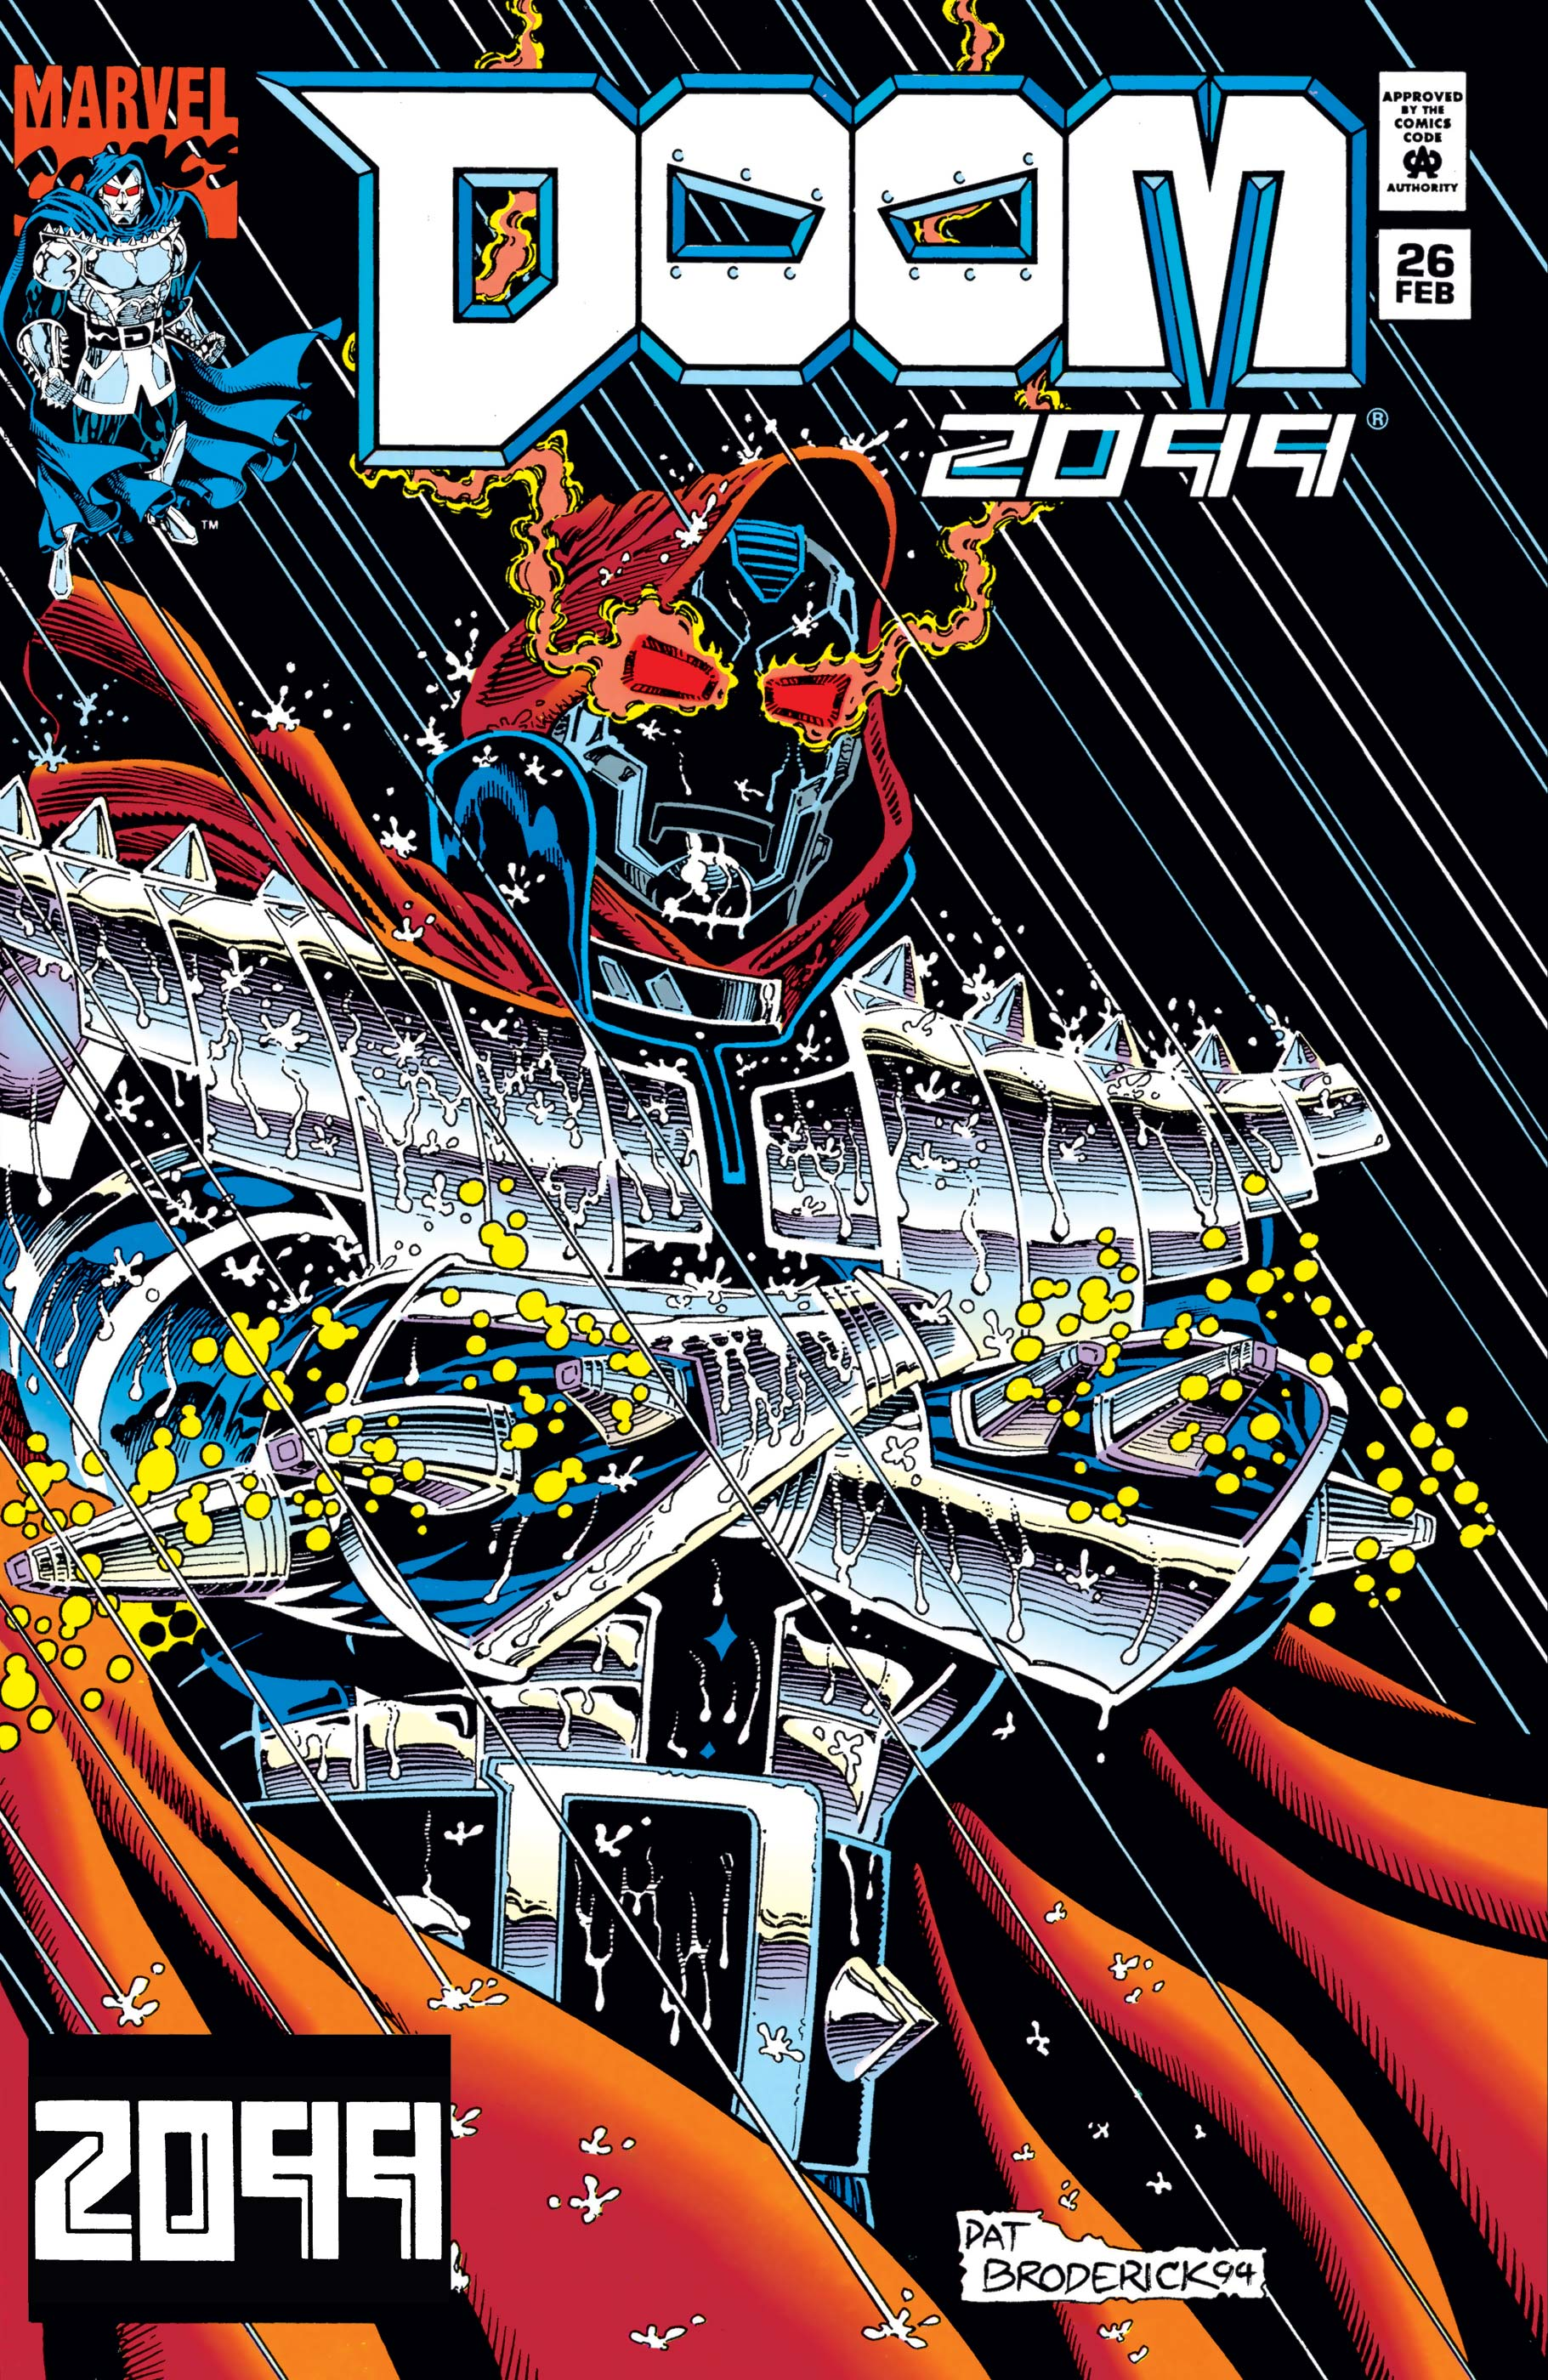 Doom 2099 (1993) #26